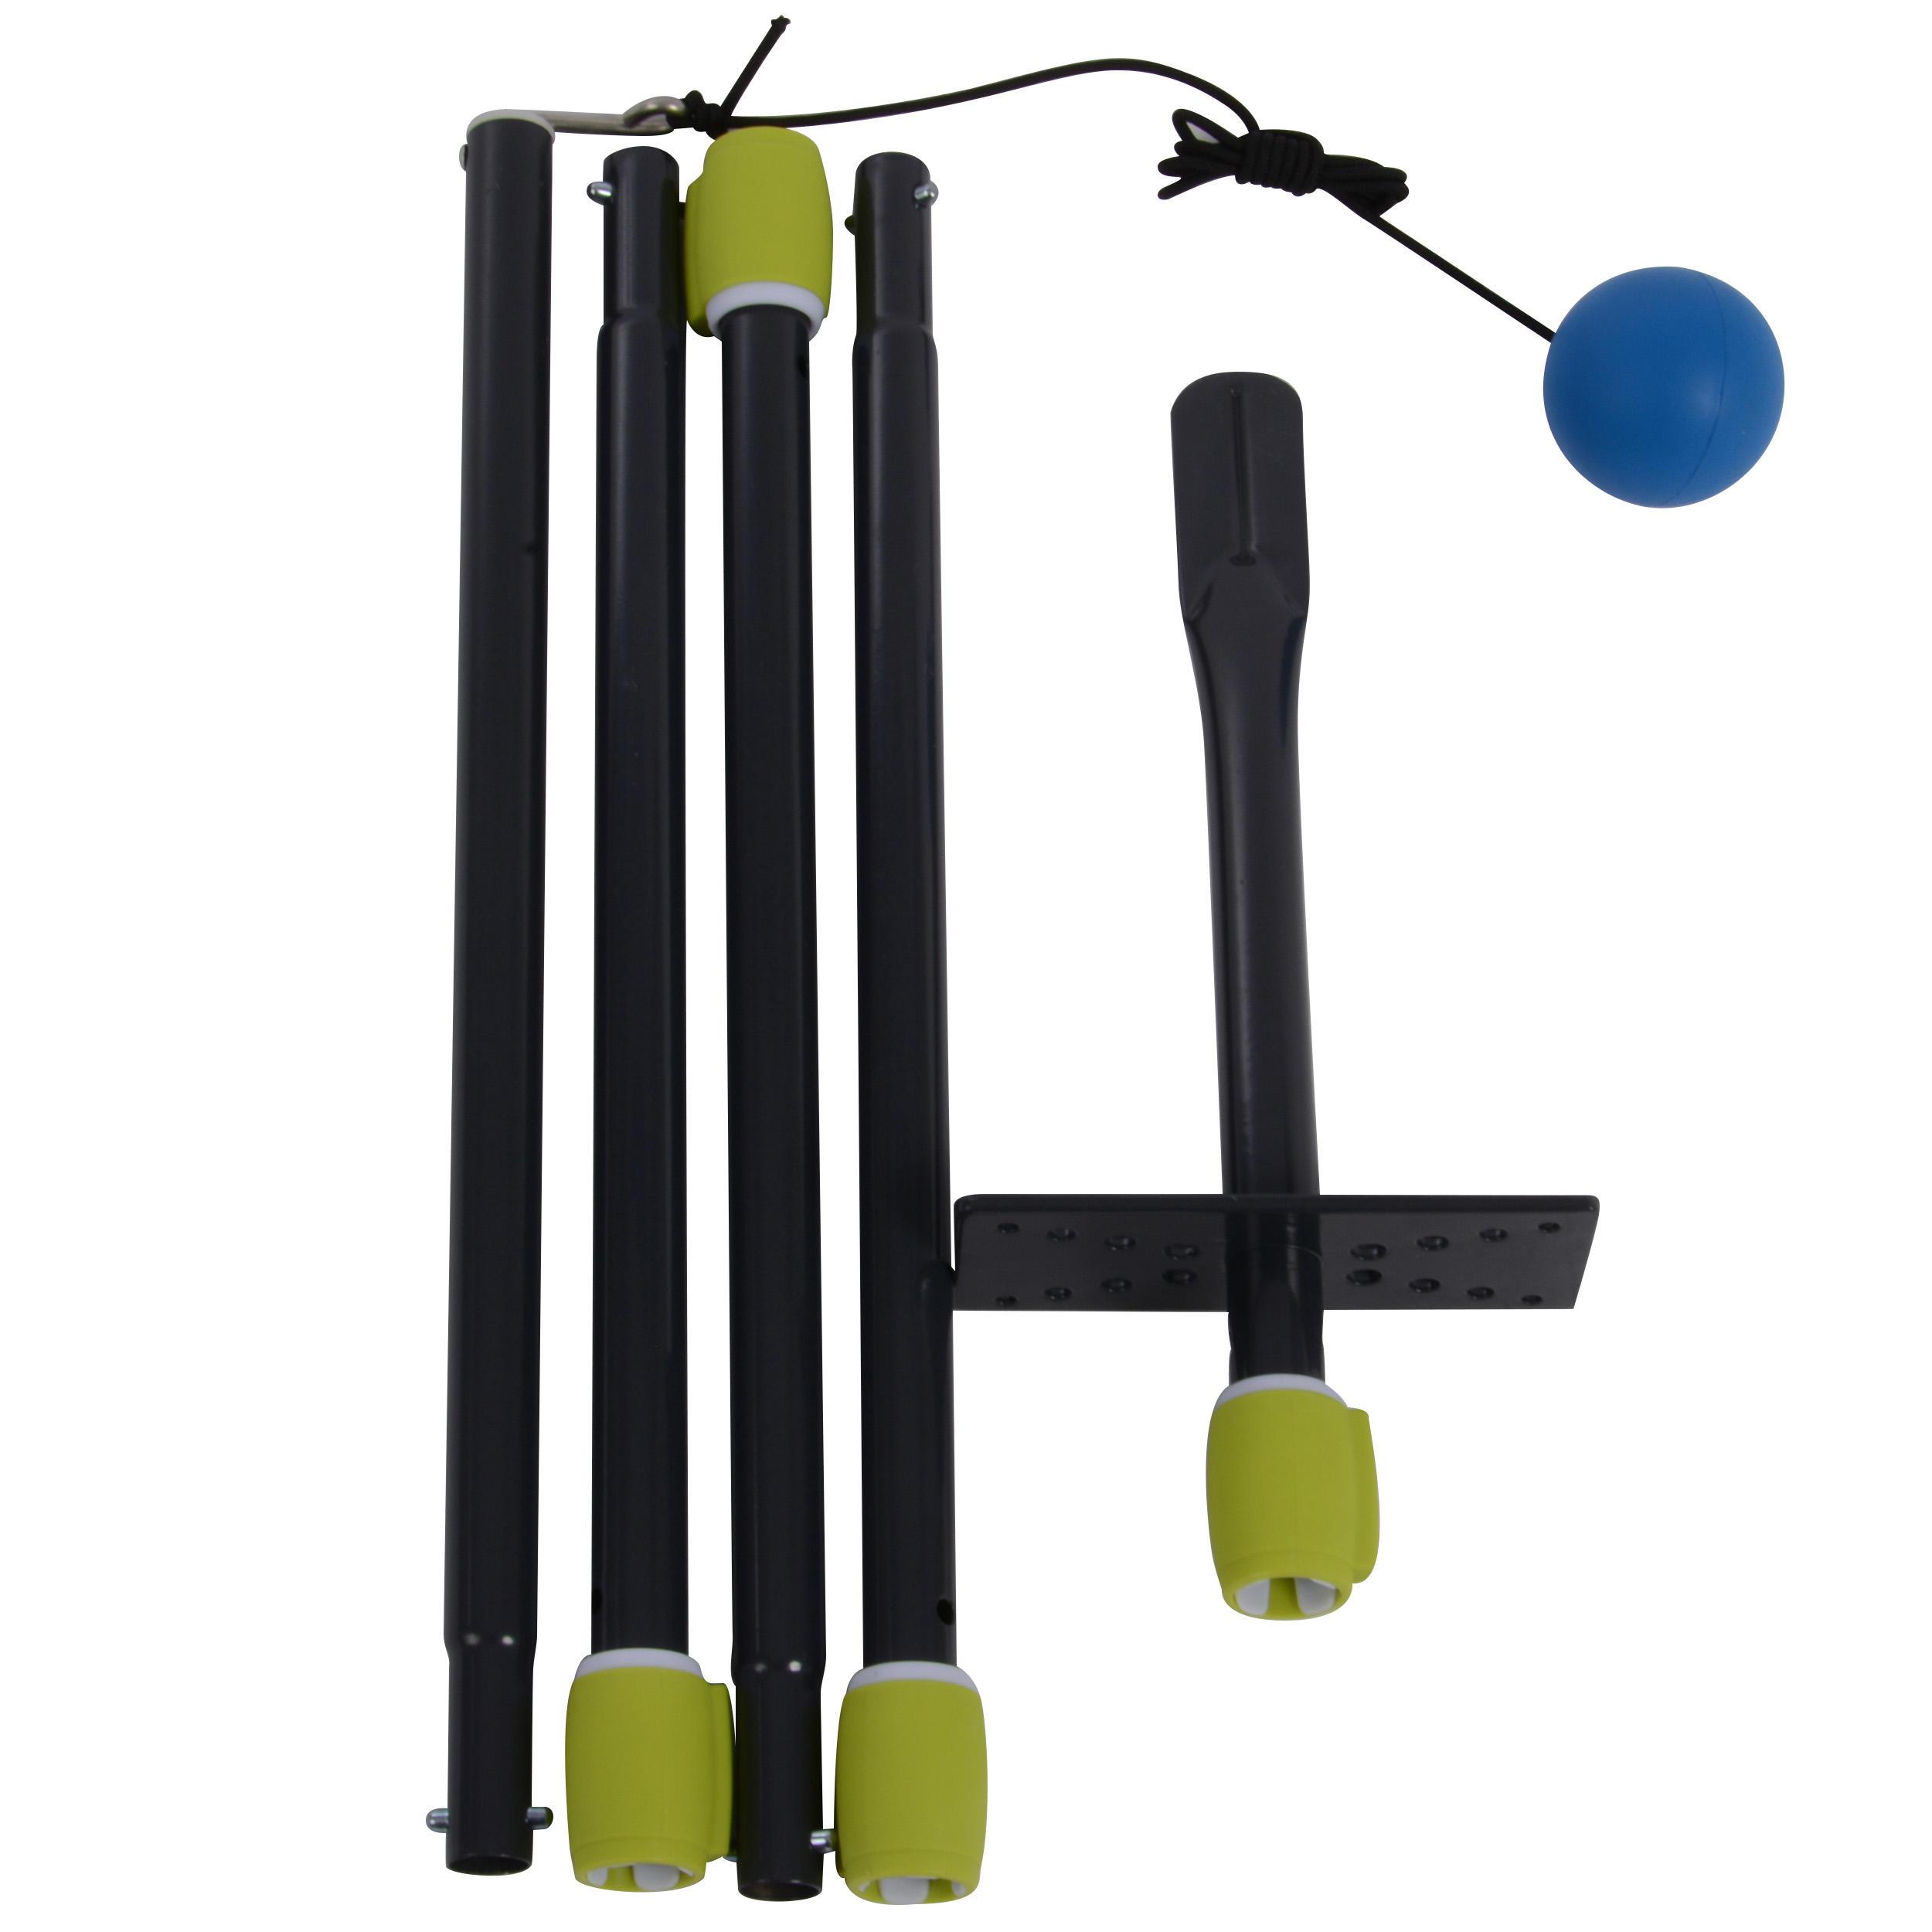 Stâlp Speedball Turnball Pole la Reducere poza